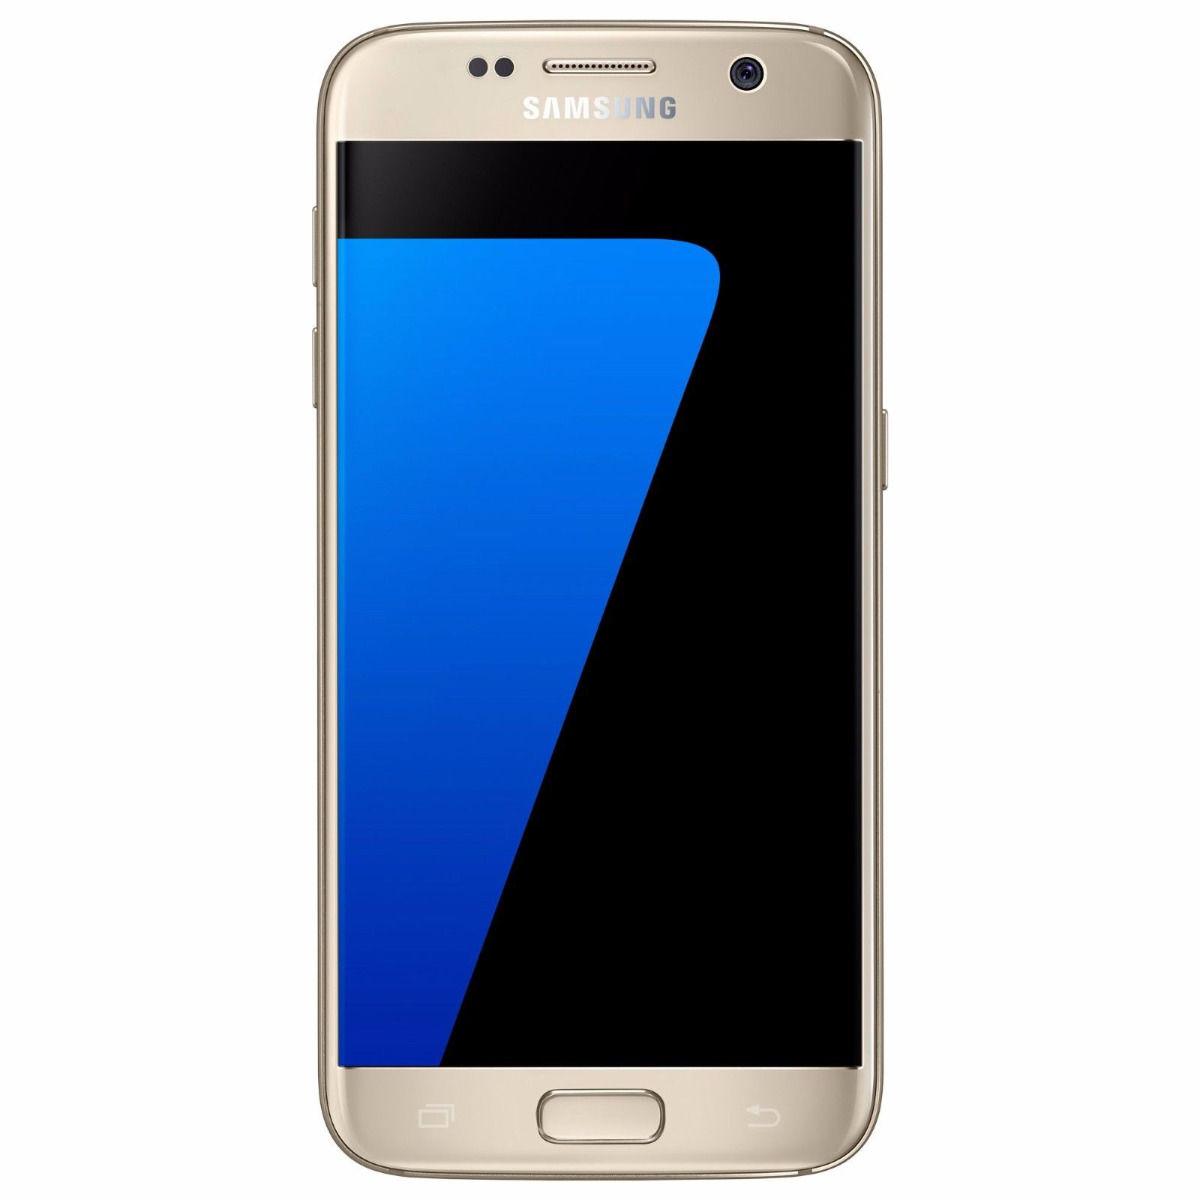 "Refurb Samsung Galaxy S7 5.1"" 32GB 4G LTE Unlocked Smartphone"